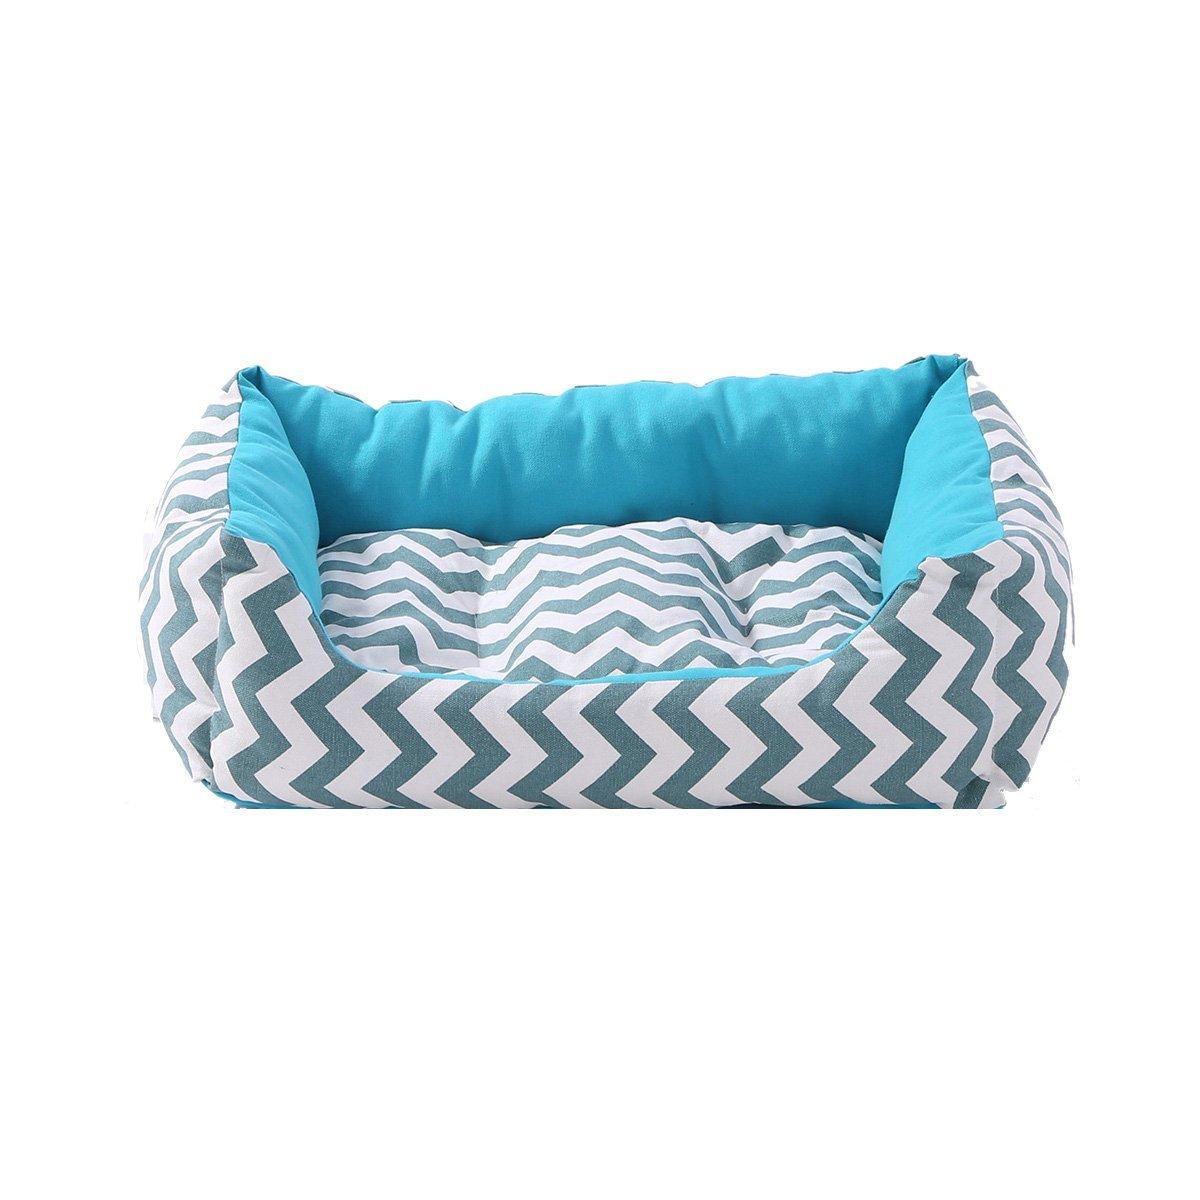 Medium SewForever bluee Wave Pet Cuddle Cushion Dog Sleeping Bed Cat Sleeping Bed with Removable Pad, Medium